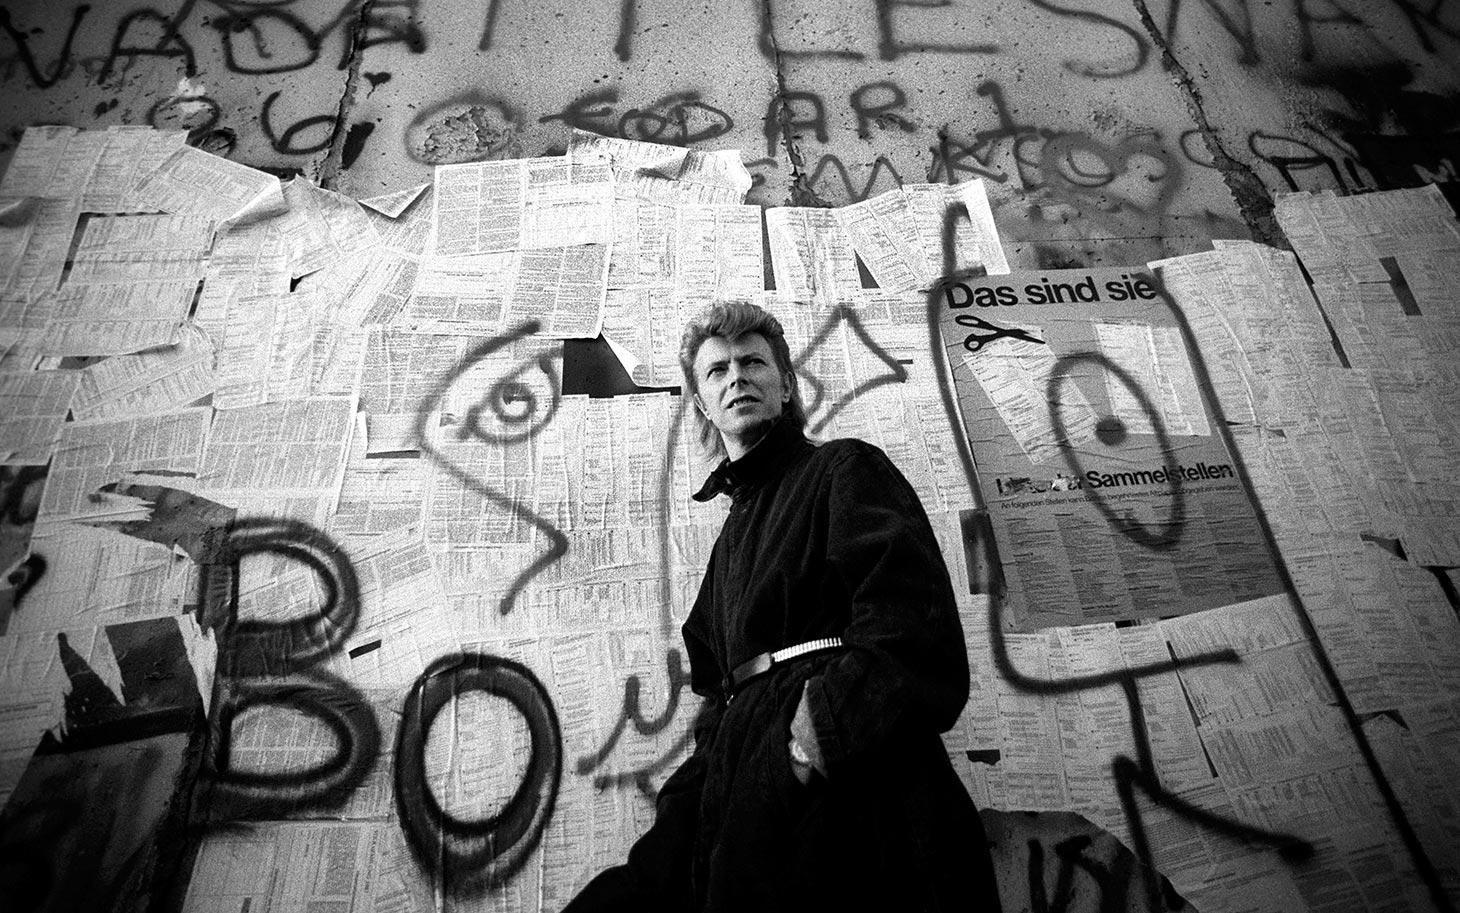 david-bowie-no-muro-de-berlim-foto-america-aljazeera-original